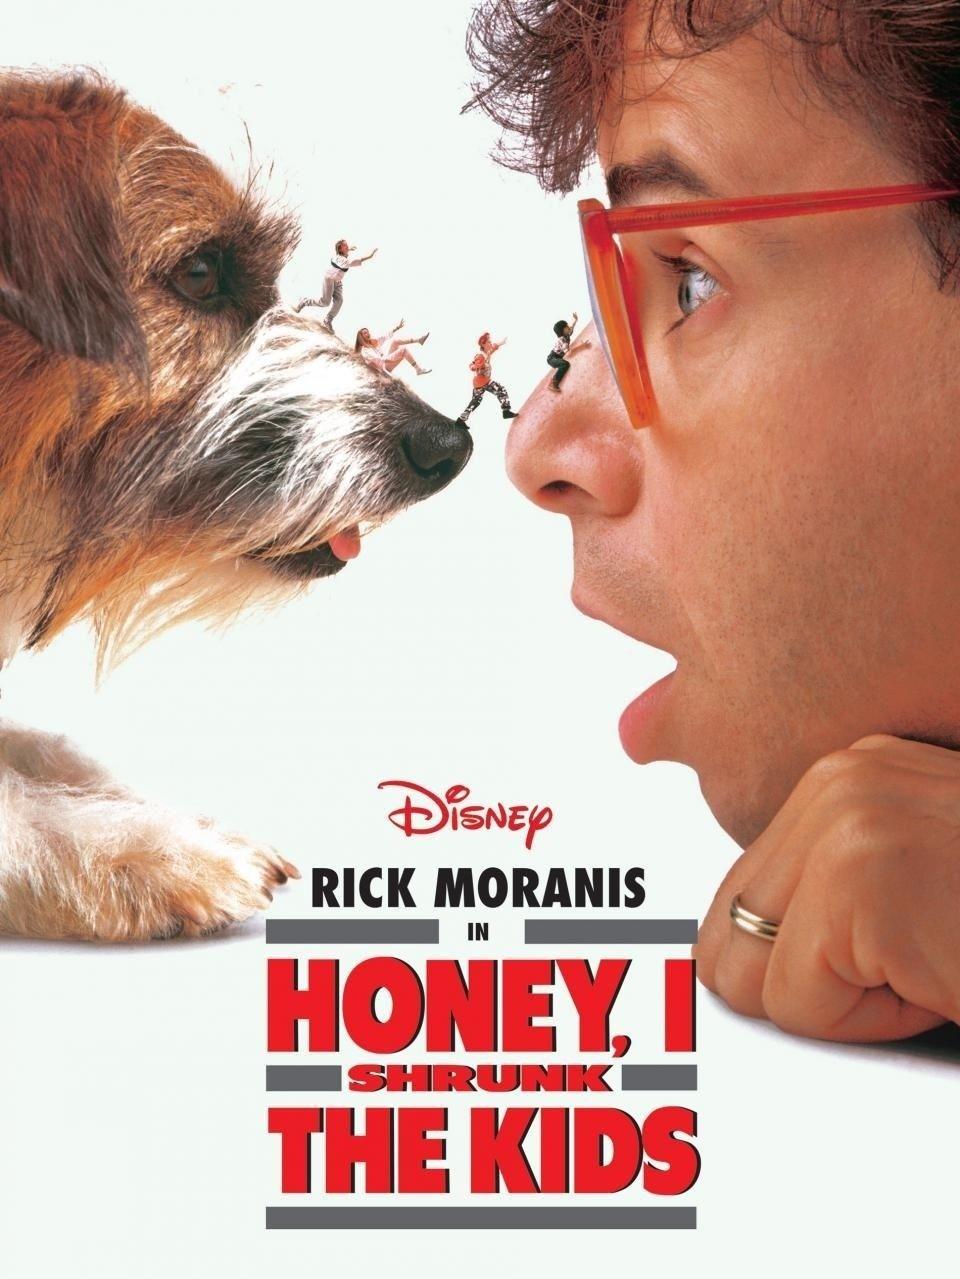 Honey, I Shrunk the Kids (1989) Kids' movies, Disney